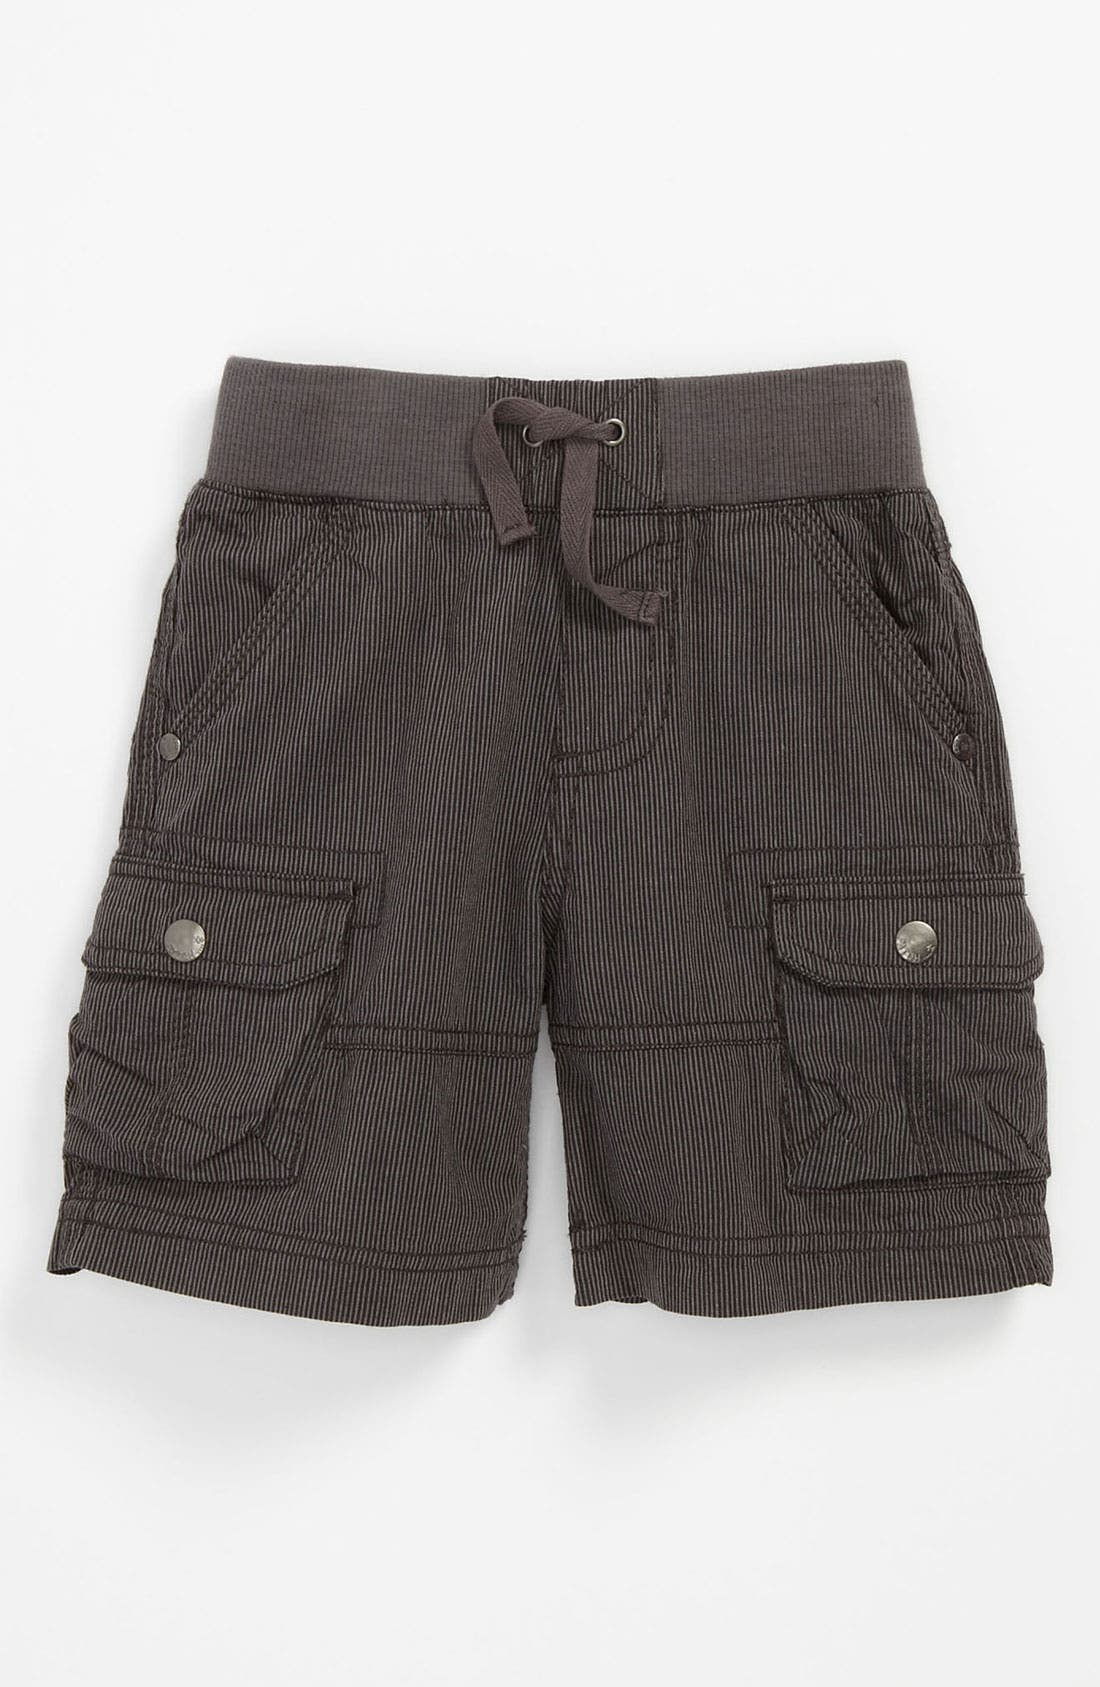 Alternate Image 1 Selected - Pumpkin Patch Pinstripe Cargo Shorts (Toddler)